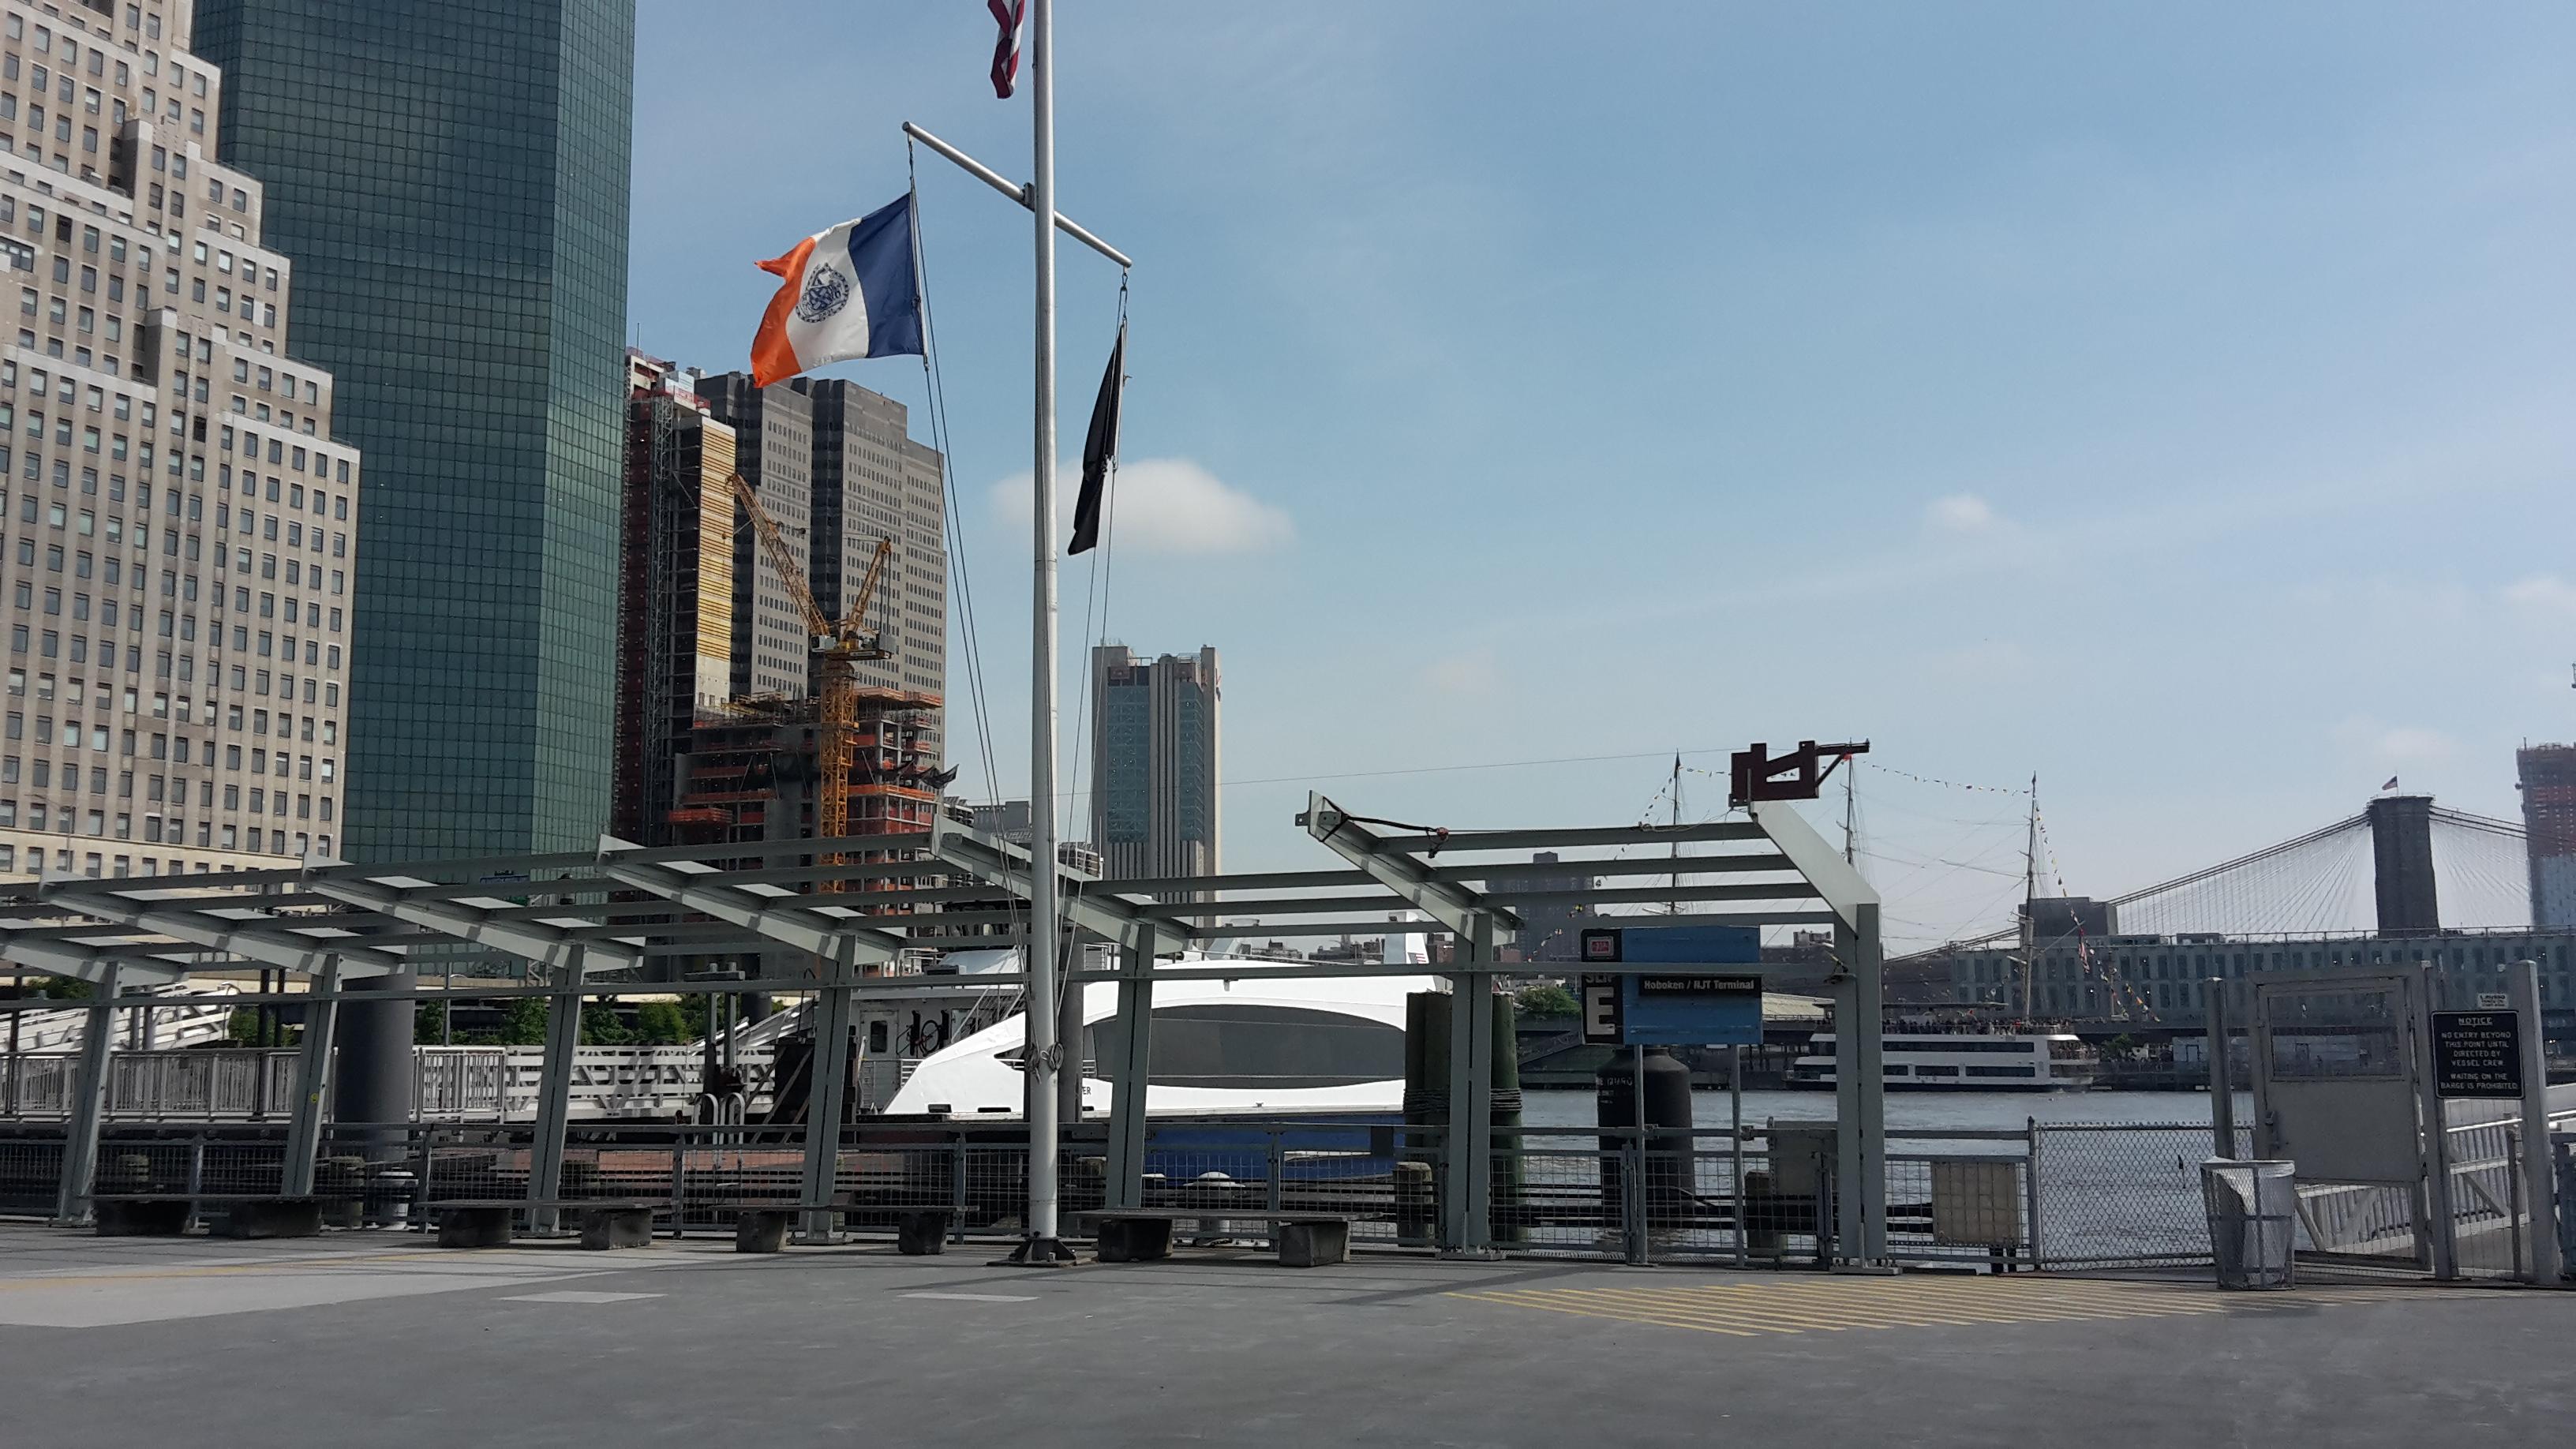 File:20170528 - Pier 11-Wall Street Ferry Terminal jpg